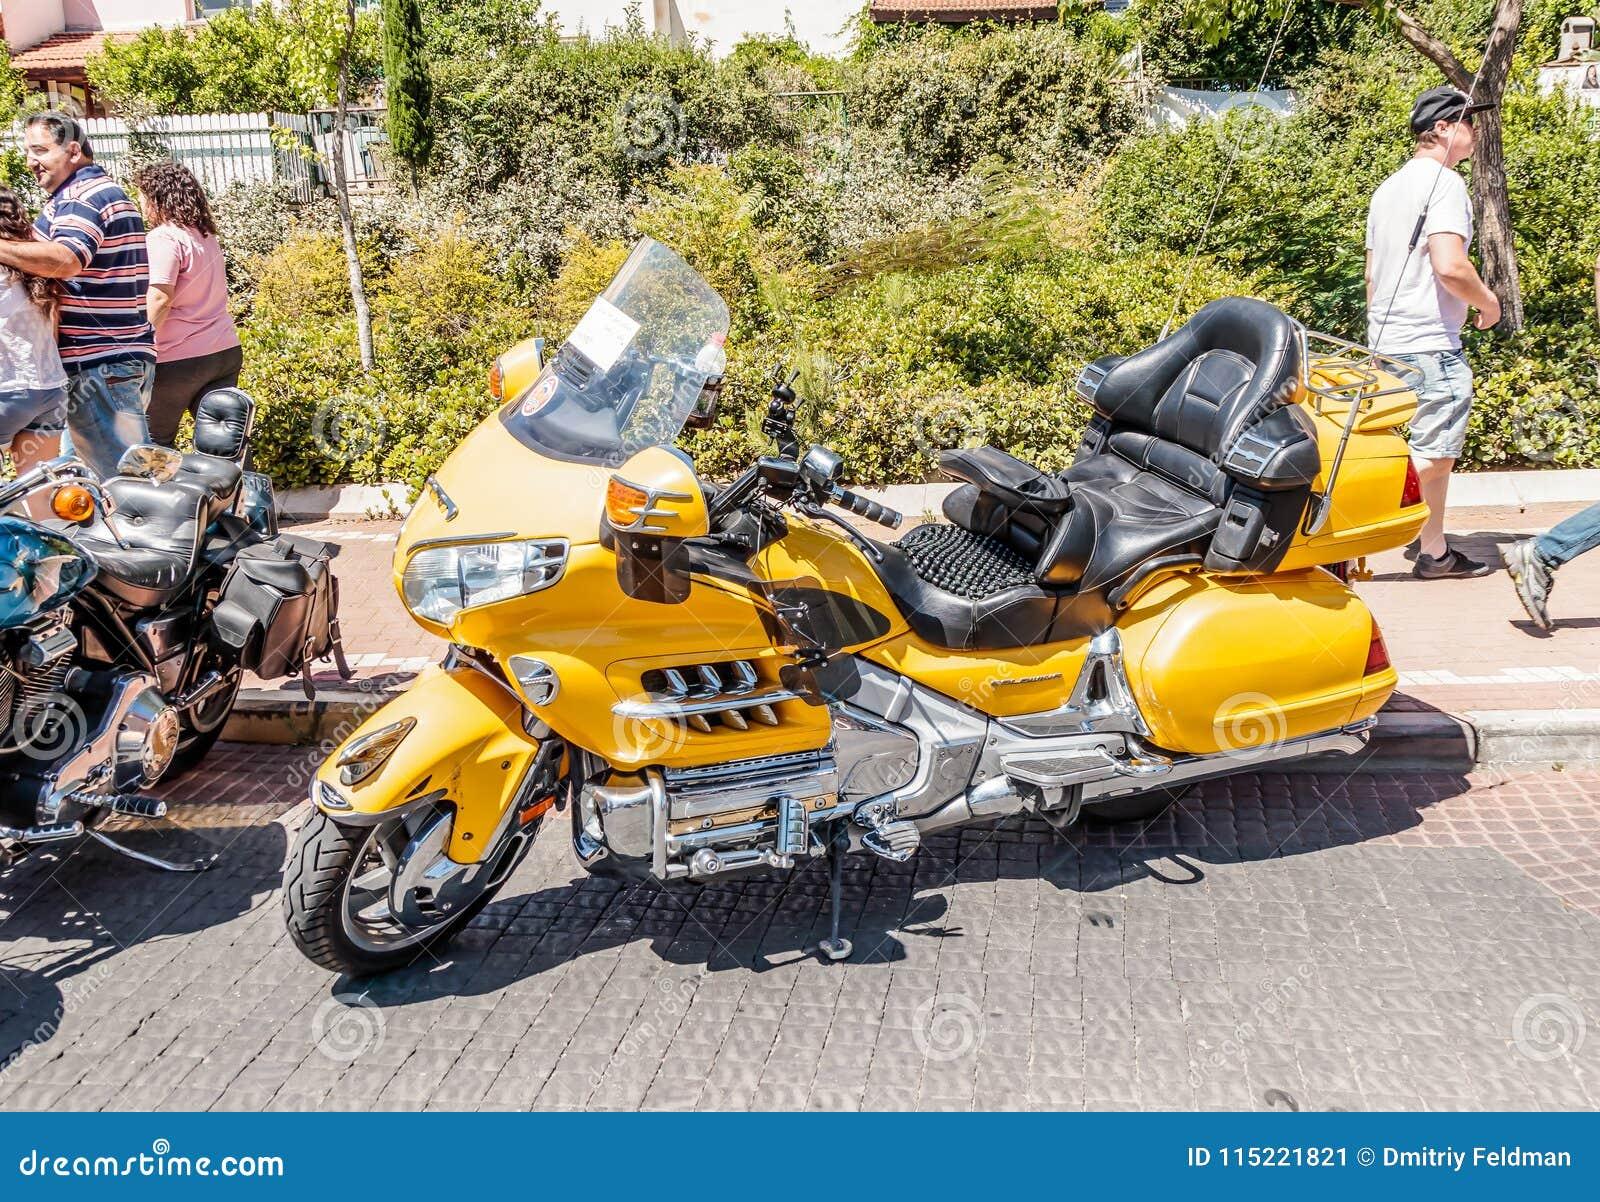 מצטיין Motorcycle Honda Goldwing At An Exhibition Of Old Cars In The Ci NG-74